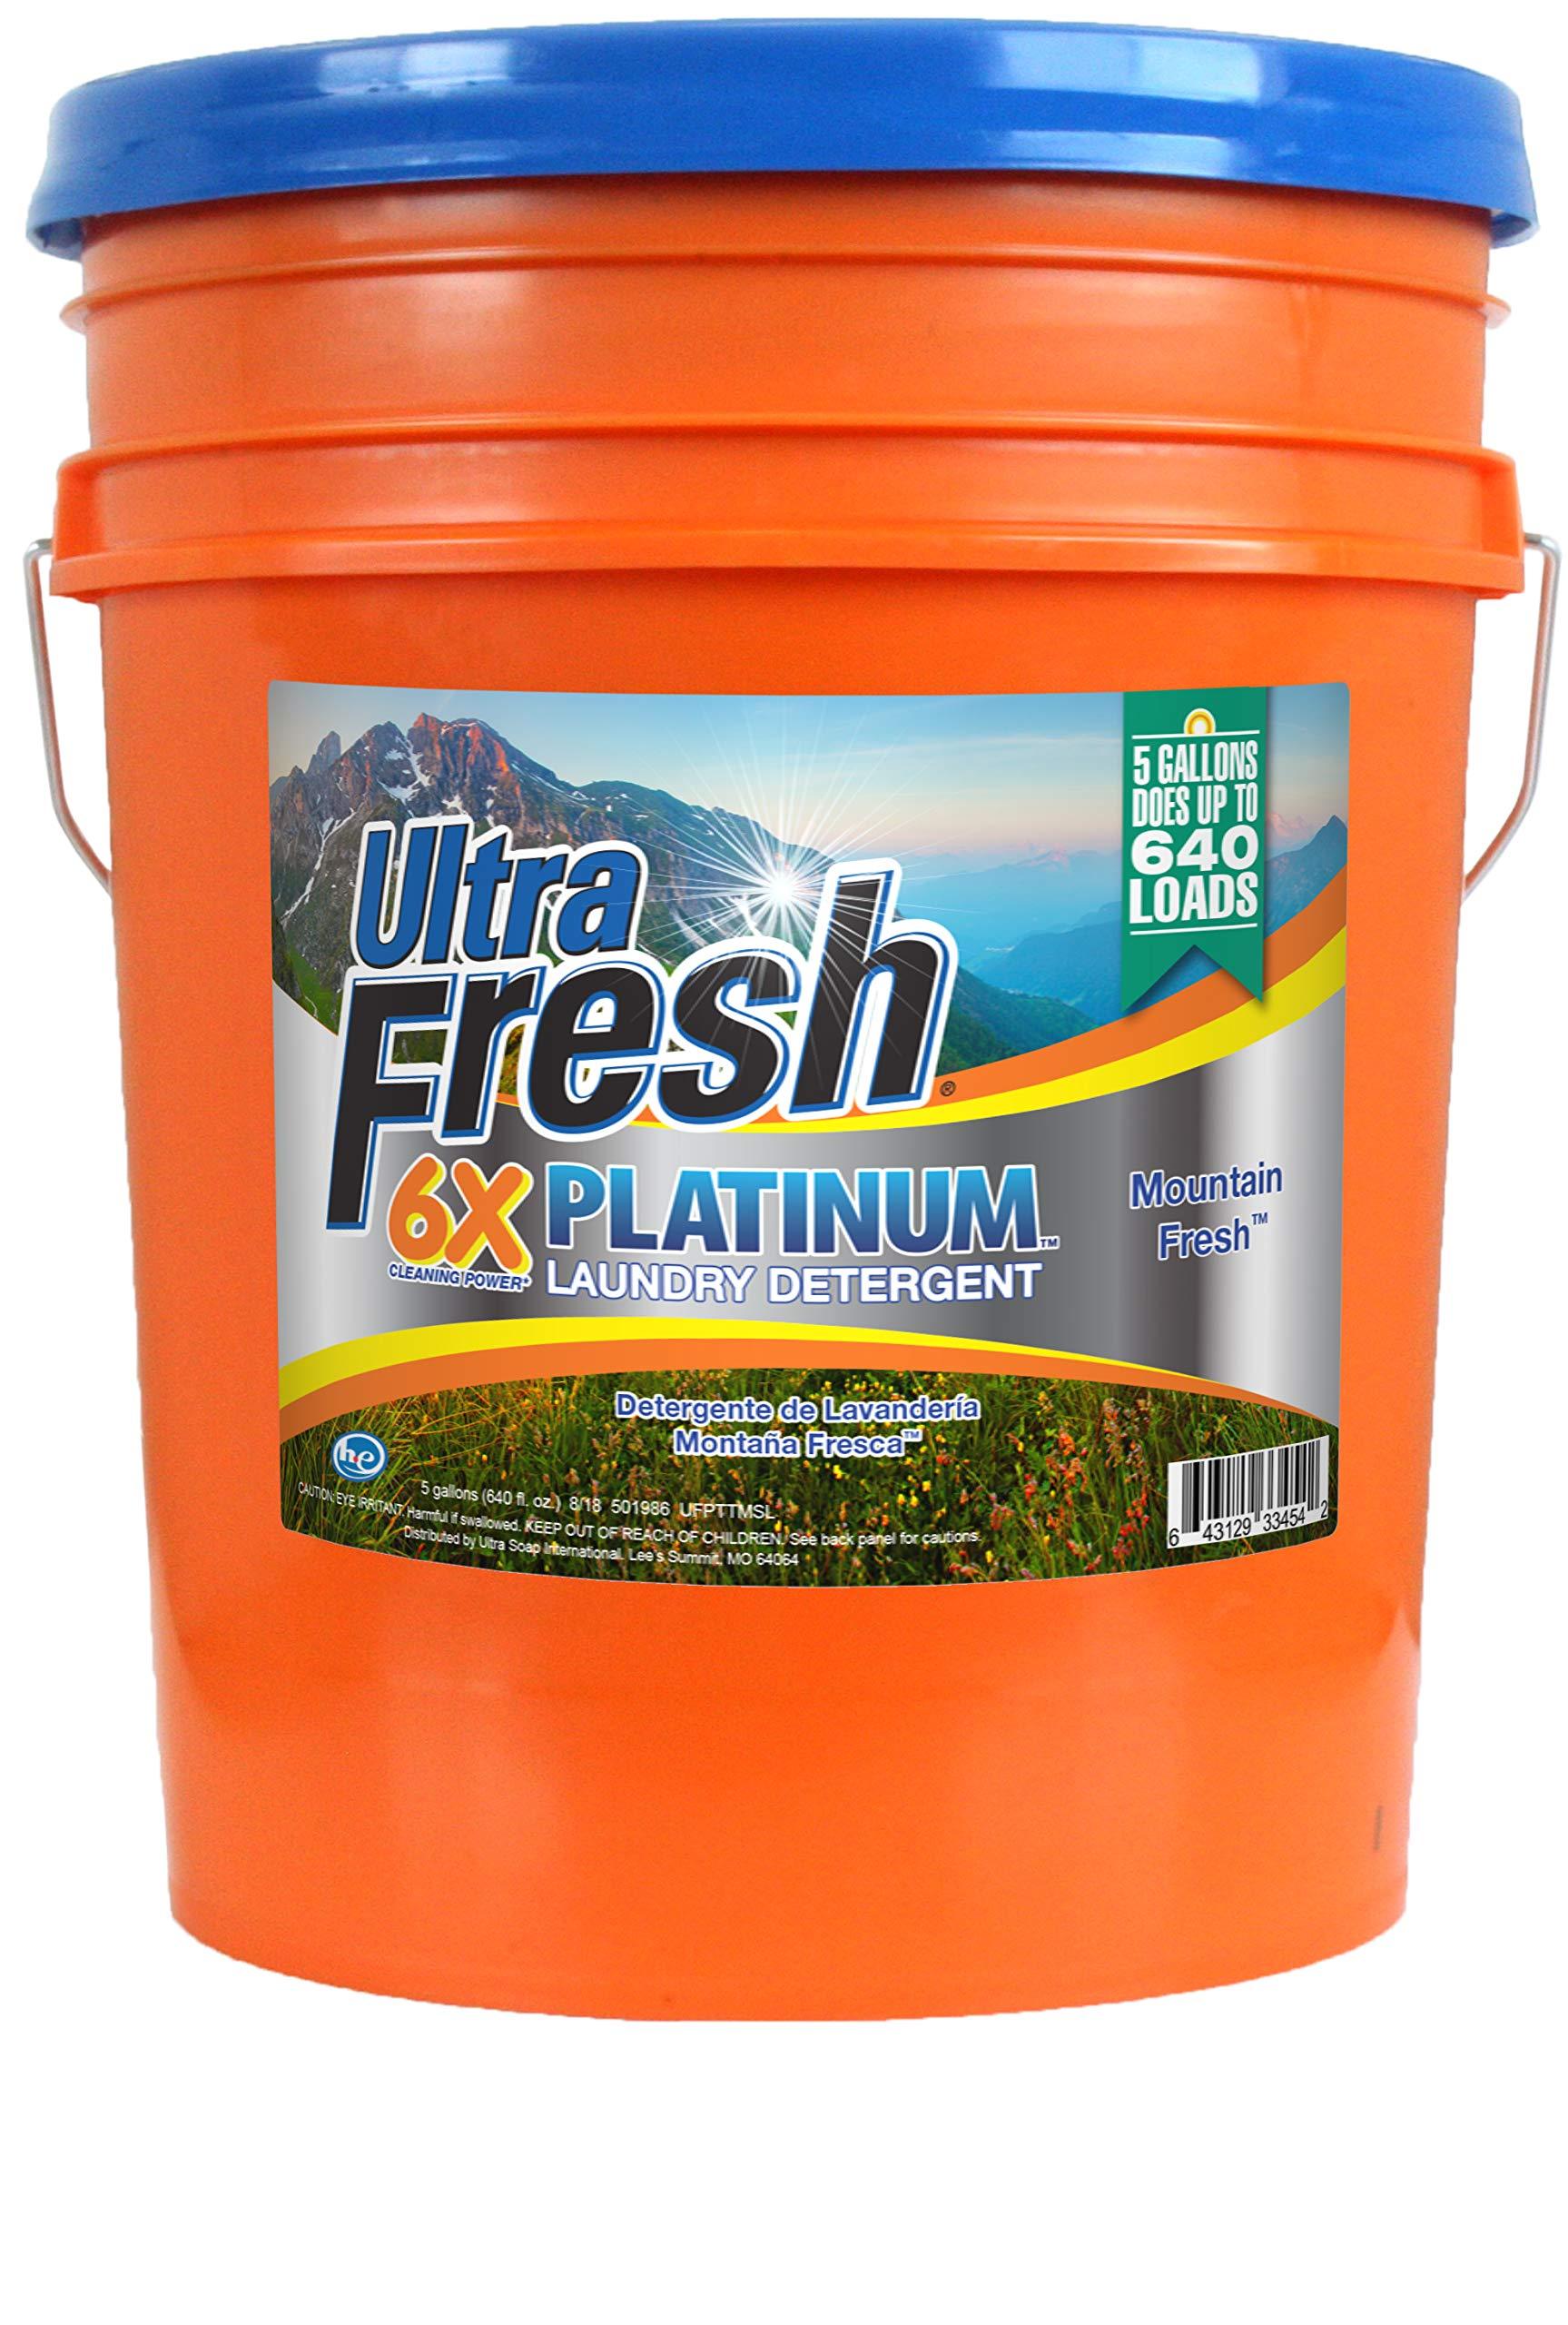 Ultra Fresh UFPTTMSL Platinum Mountain Fresh Laundry Detergent, 5 gal, 640 oz.